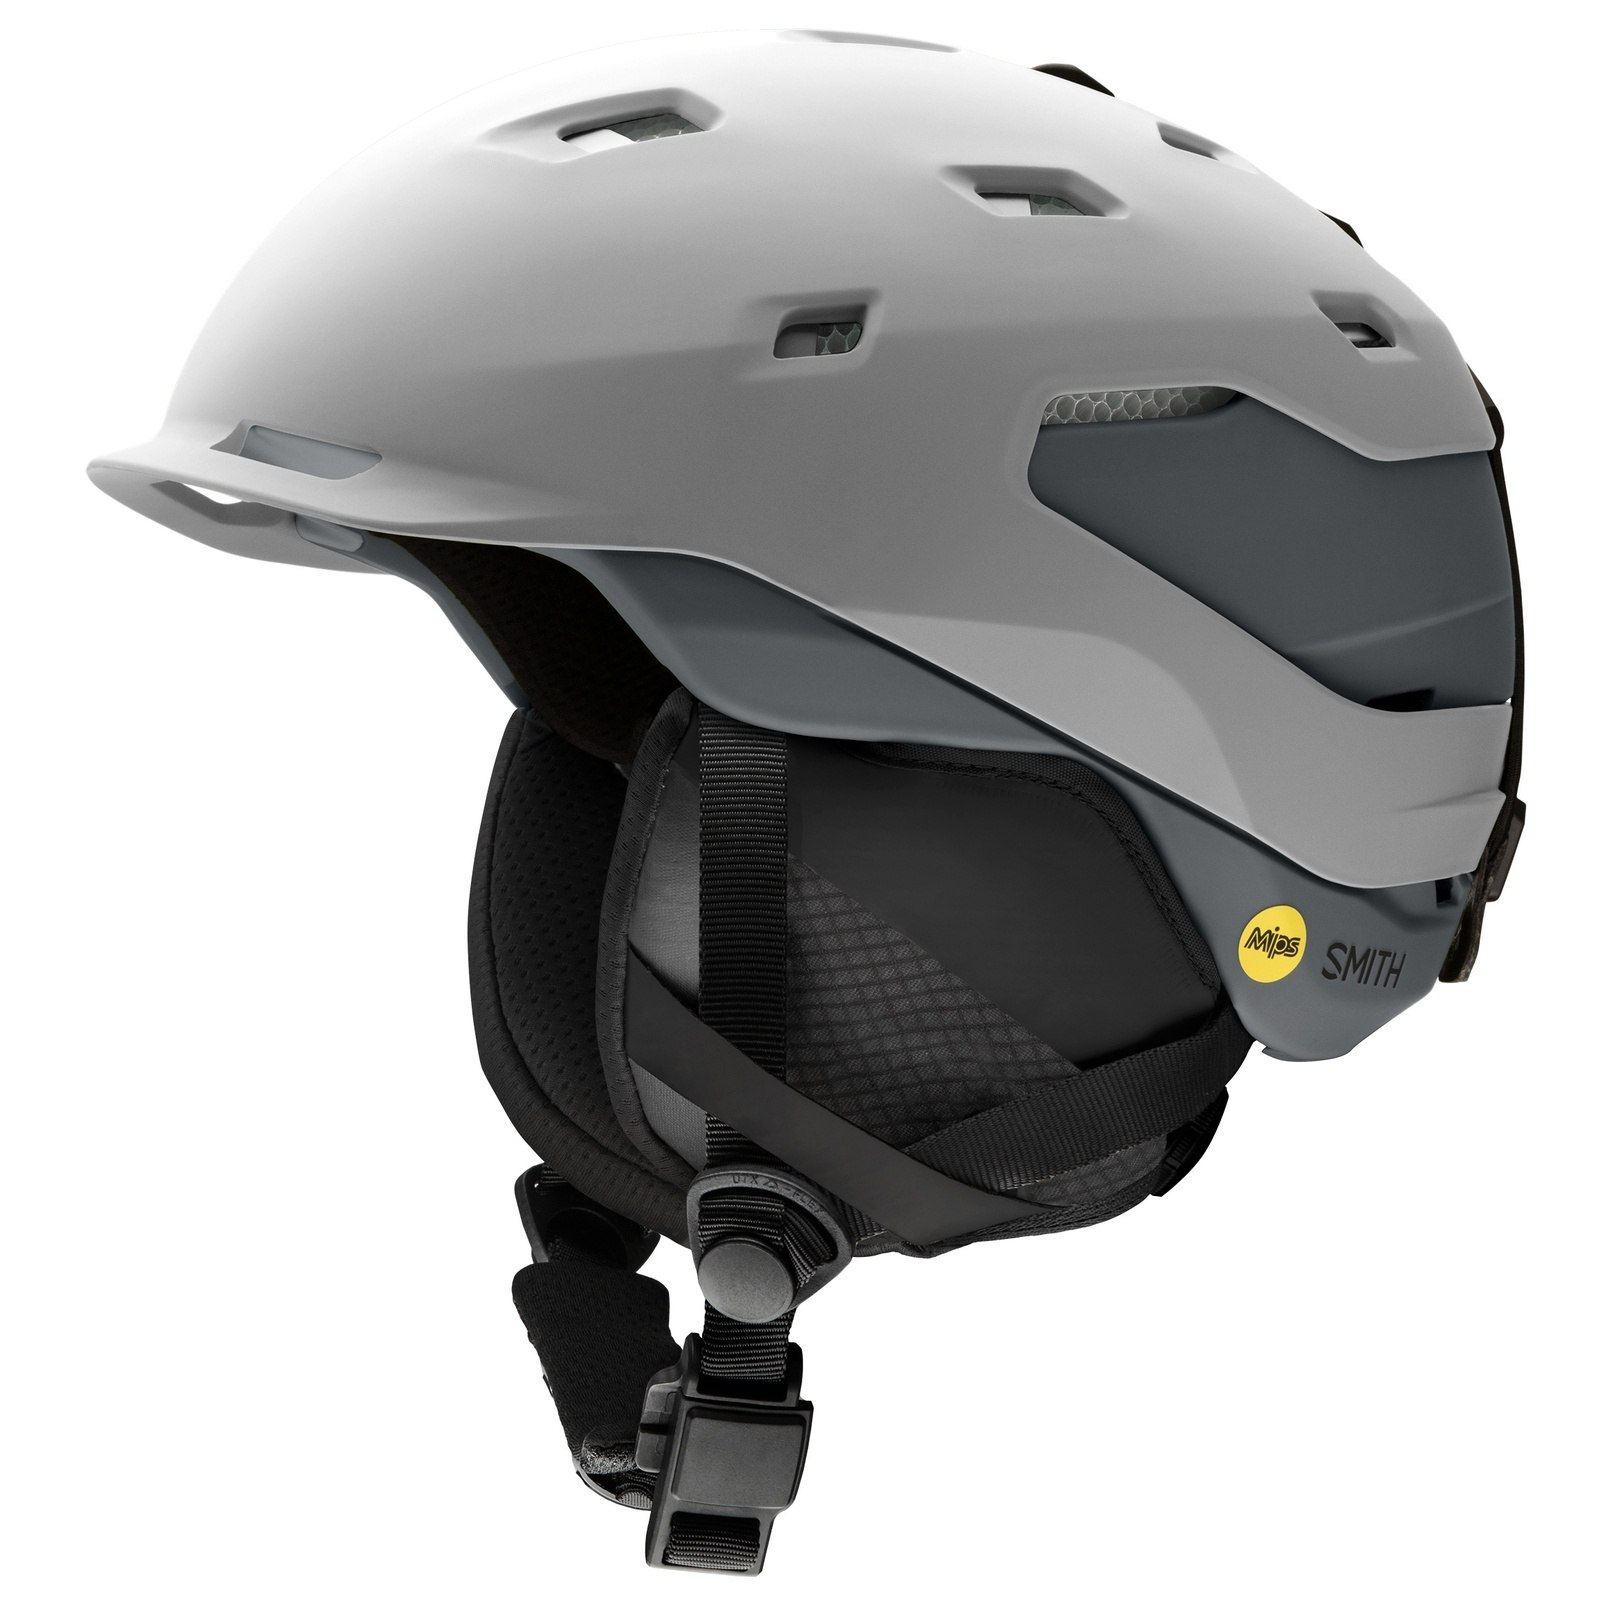 Ski Helmet Sale >> Smith Men S Quantum Mips Ski Helmet On Sale Powder7 Com